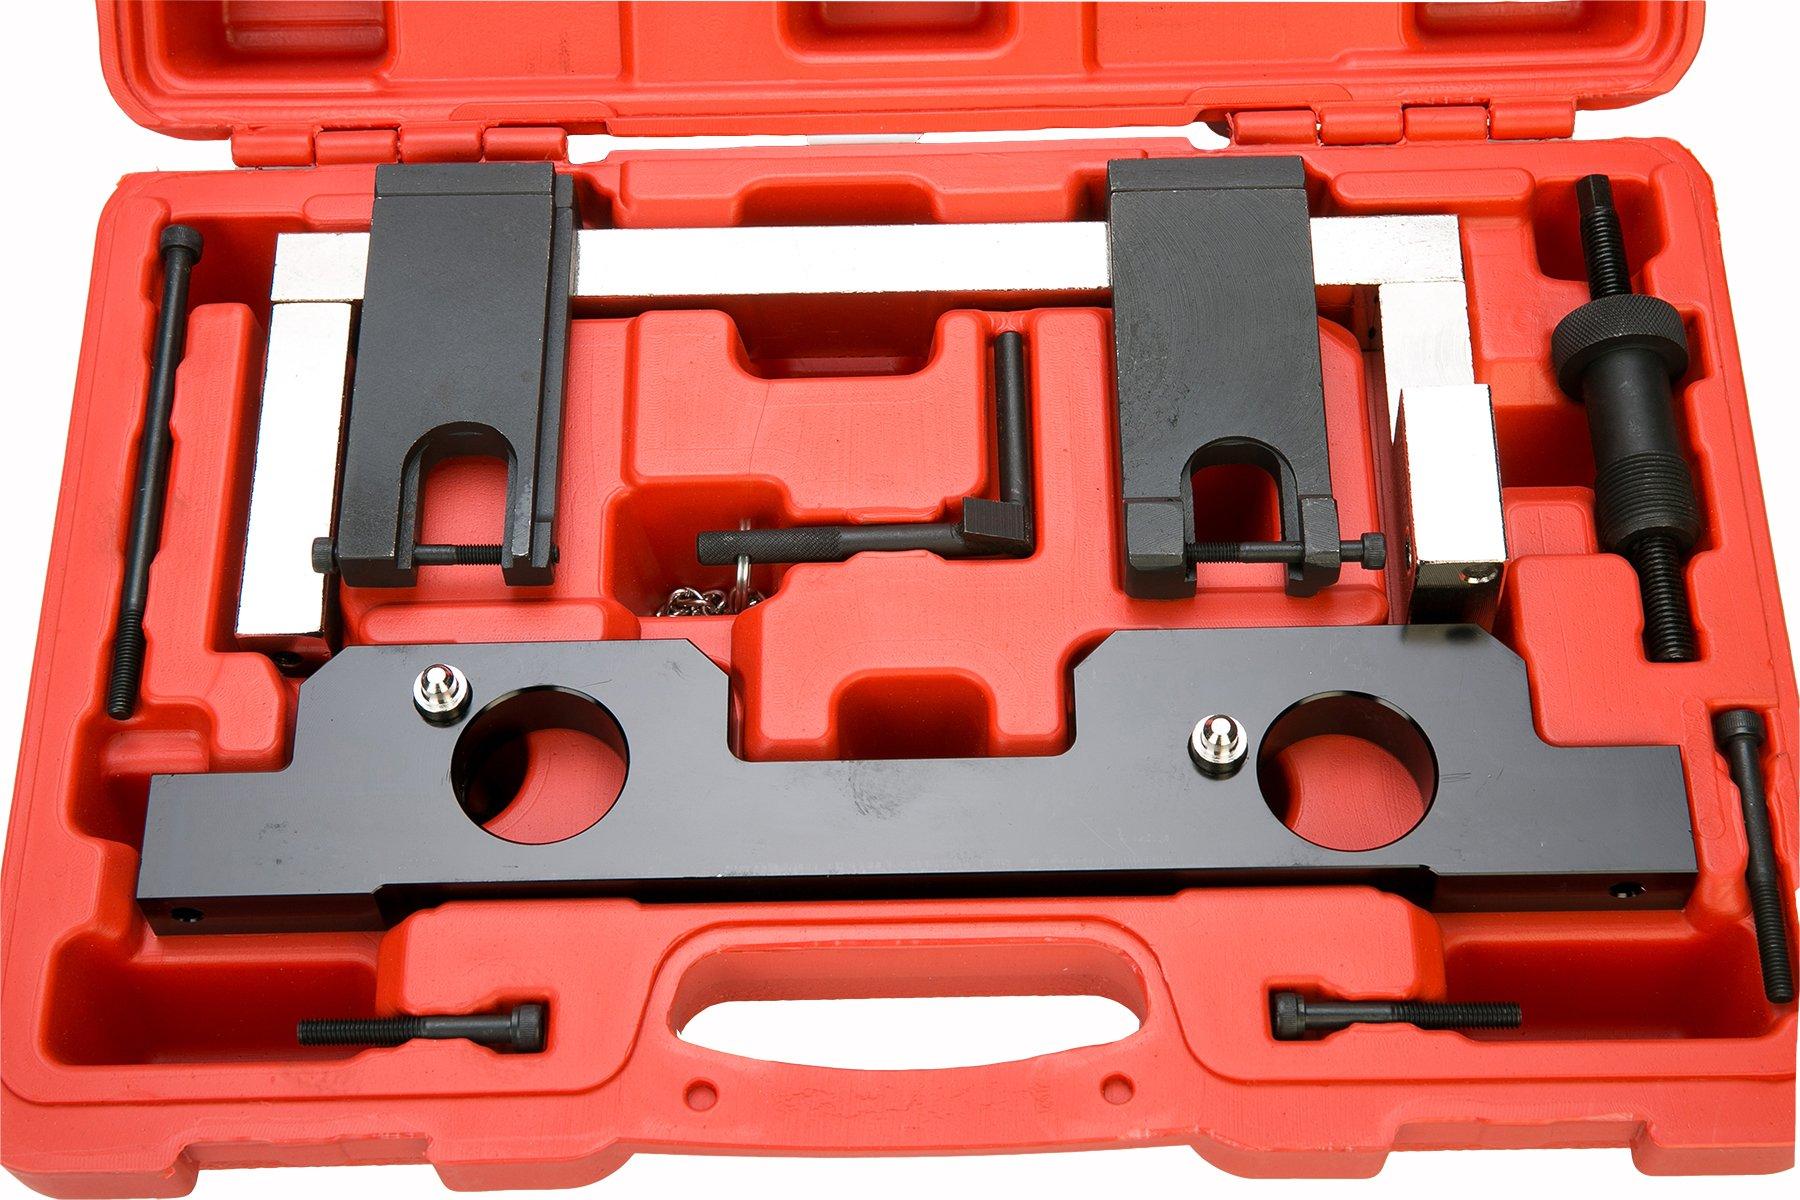 8MILELAKE Engine Alignment Locking Timing Tool Compatible for BMW N20 N26 Vanos Cam Camshaft by 8MILELAKE (Image #4)